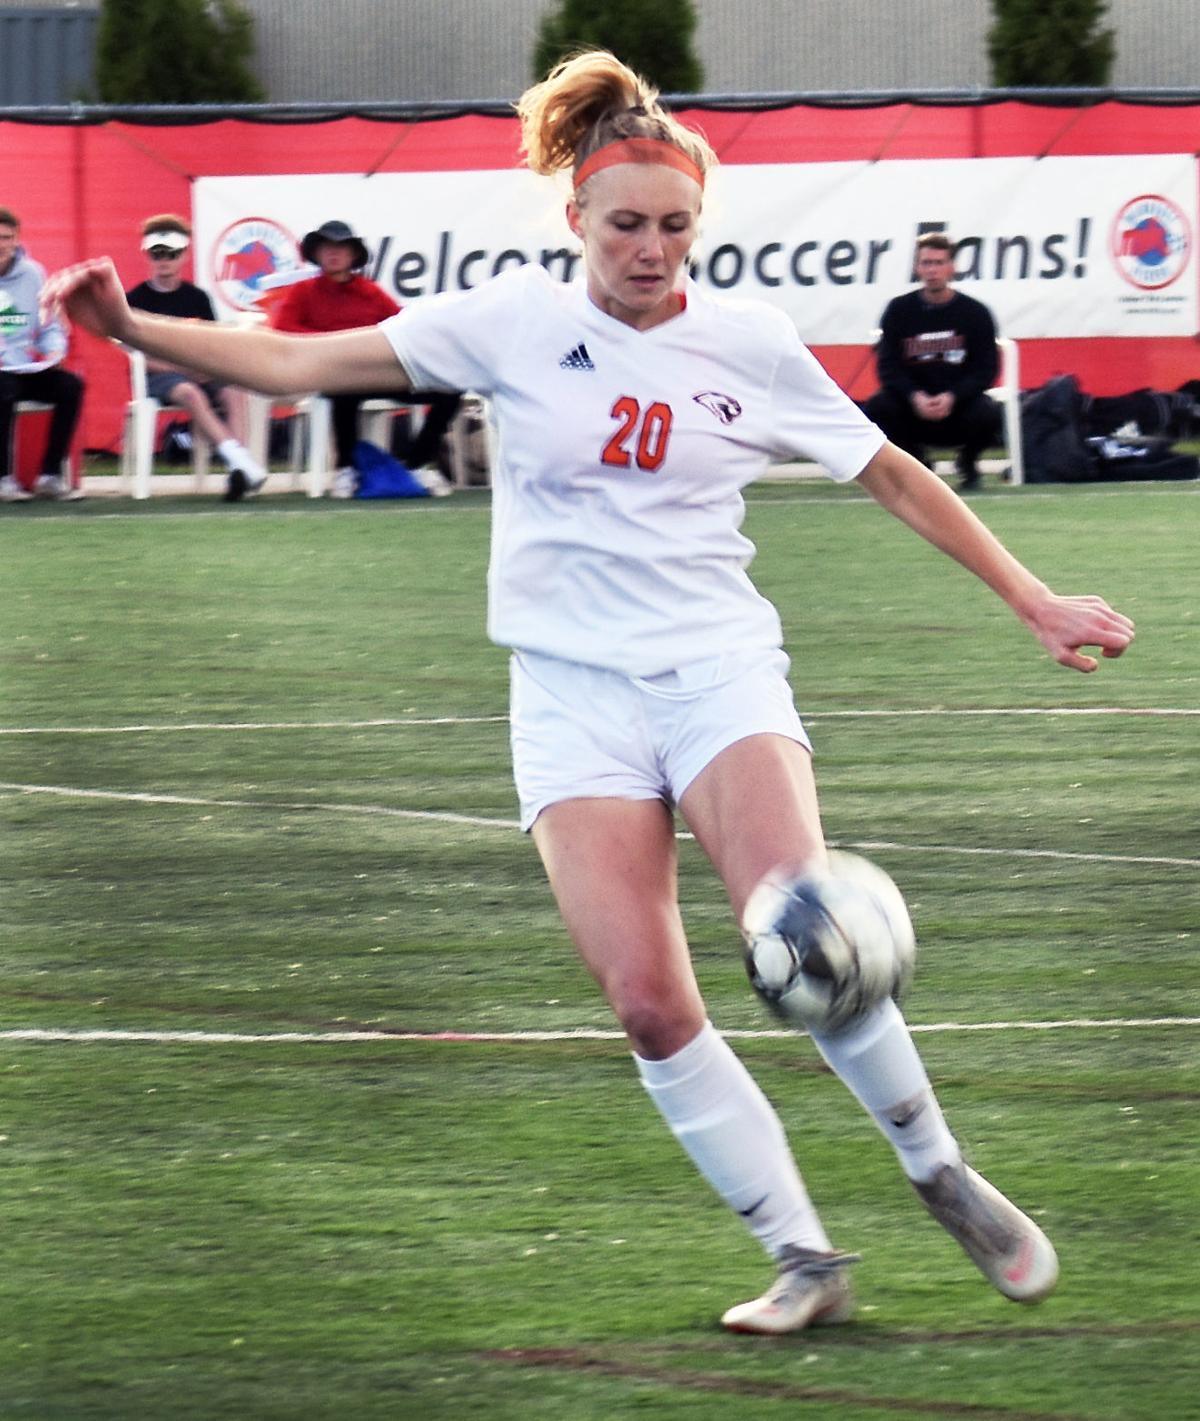 WIAA state girls soccer photo: Oregon's Emma Halverson